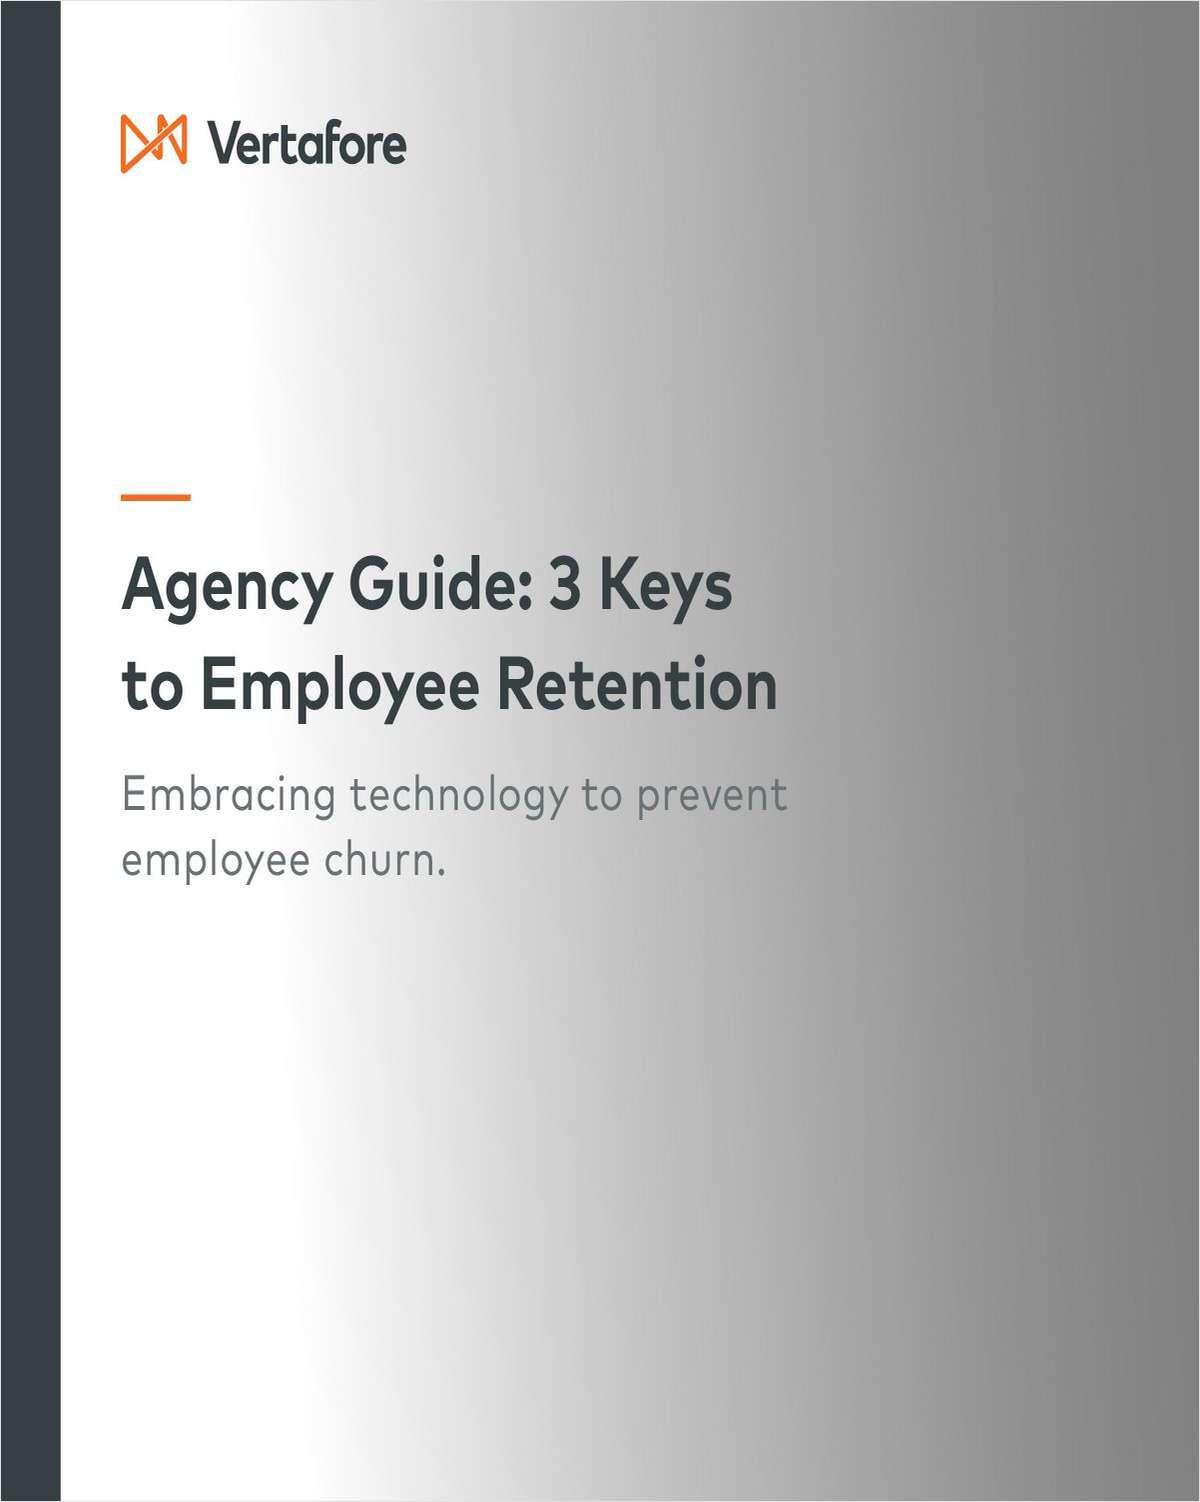 Agency Guide: 3 Keys to Employee Retention